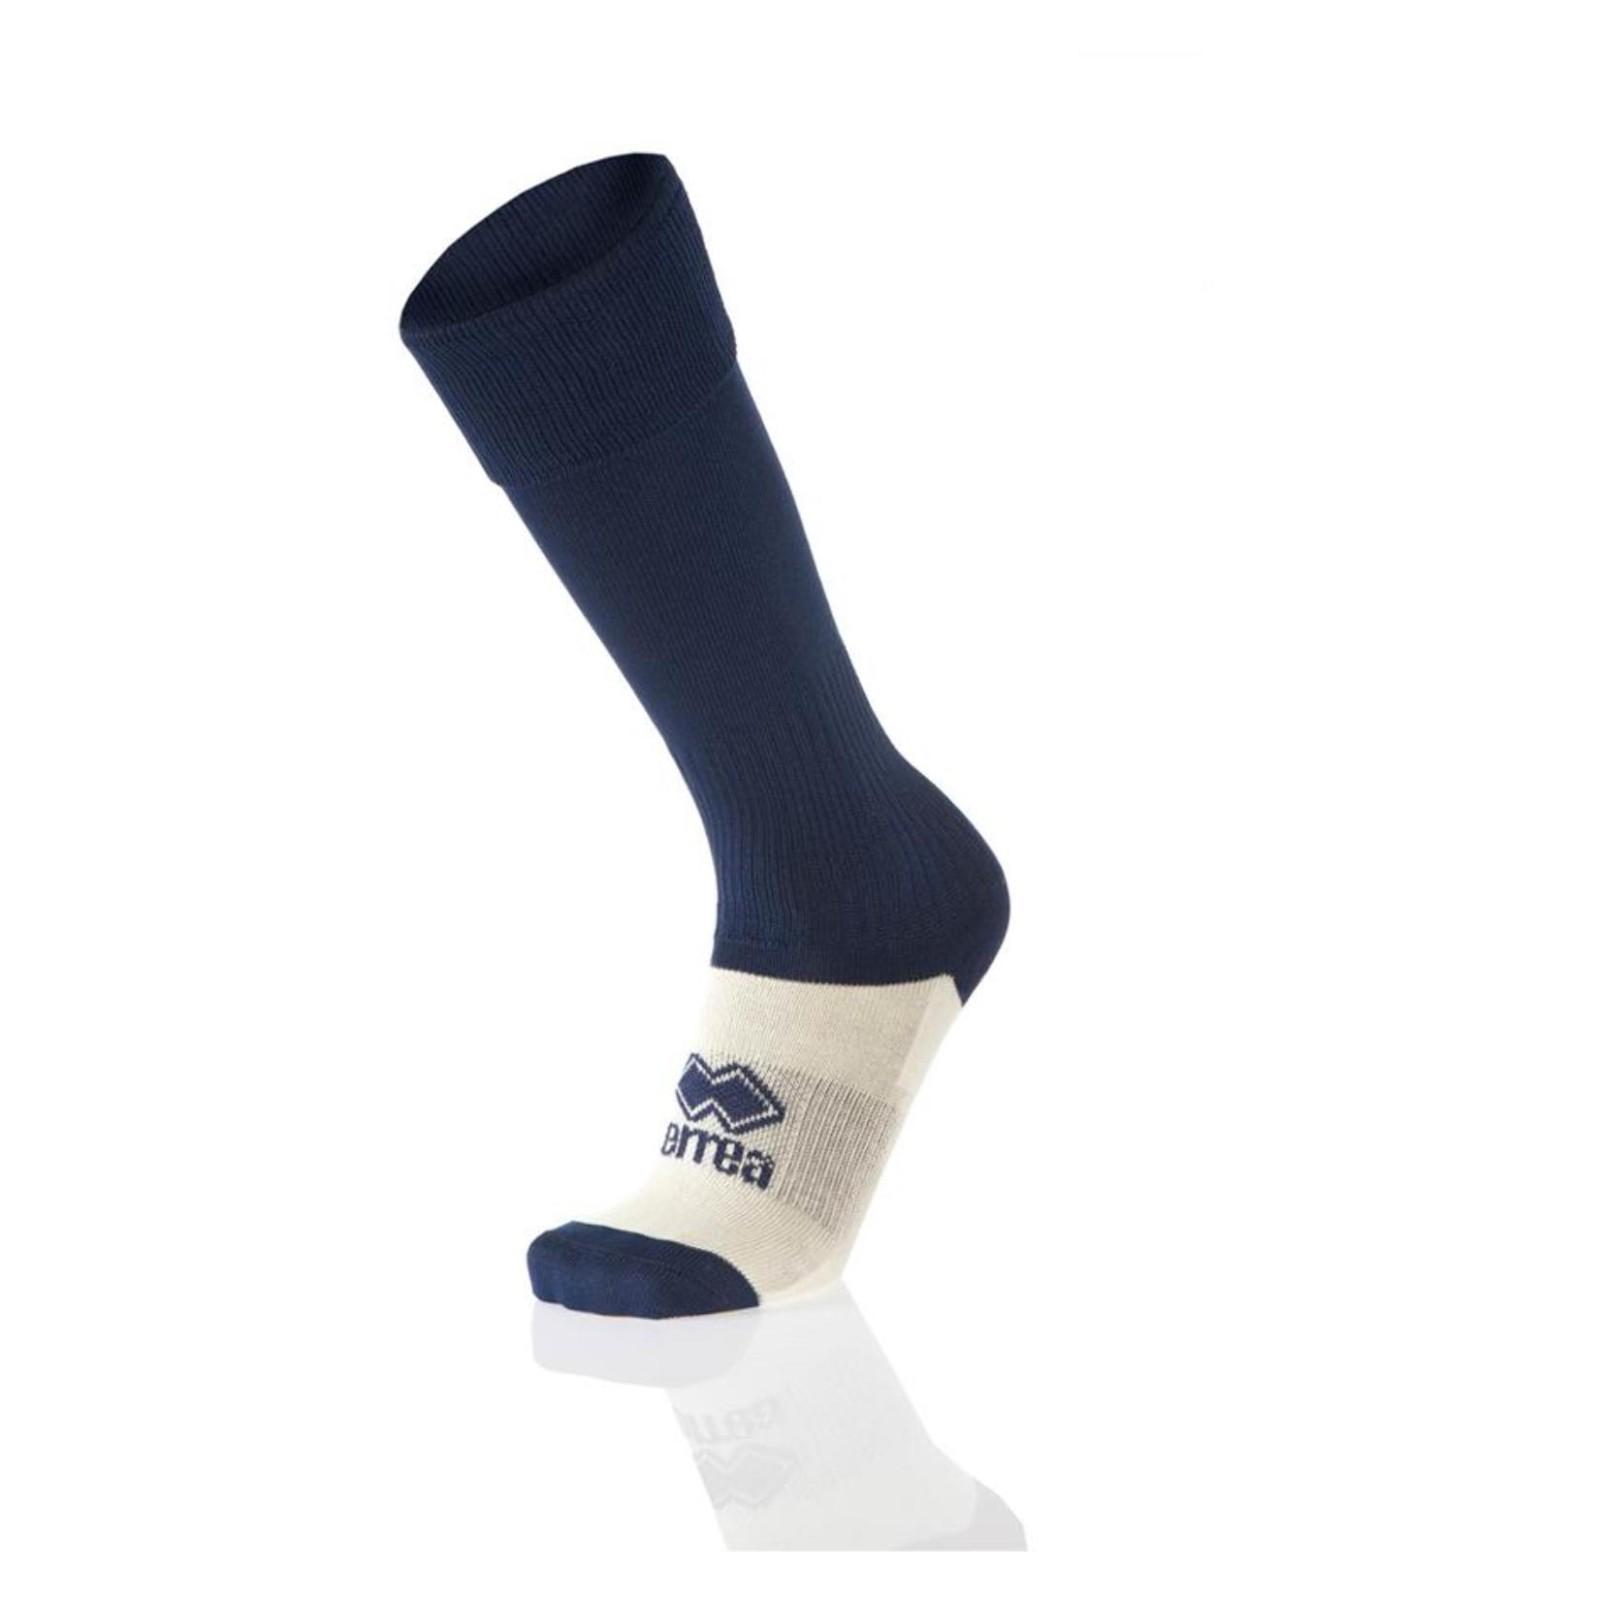 Errea W/f Polypropylene Socks